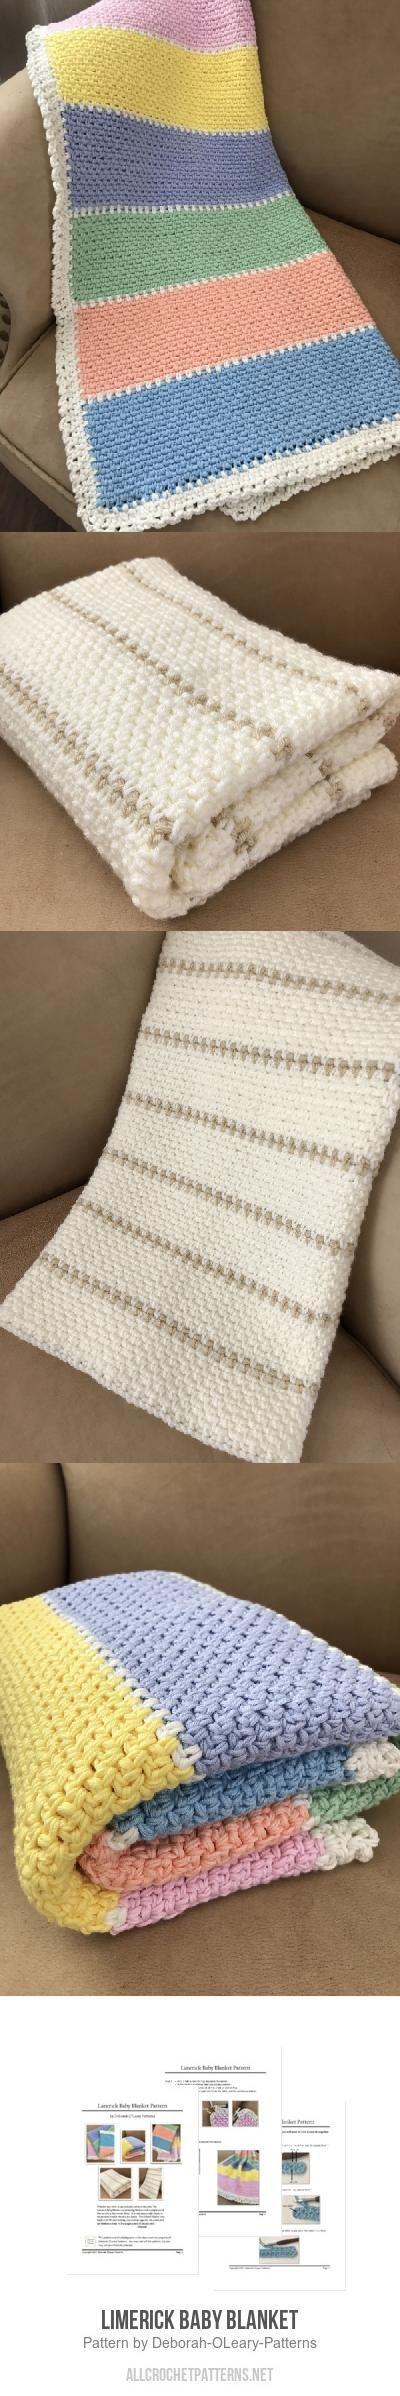 Limerick Baby Blanket crochet pattern by Deborah O\'Leary Patterns ...